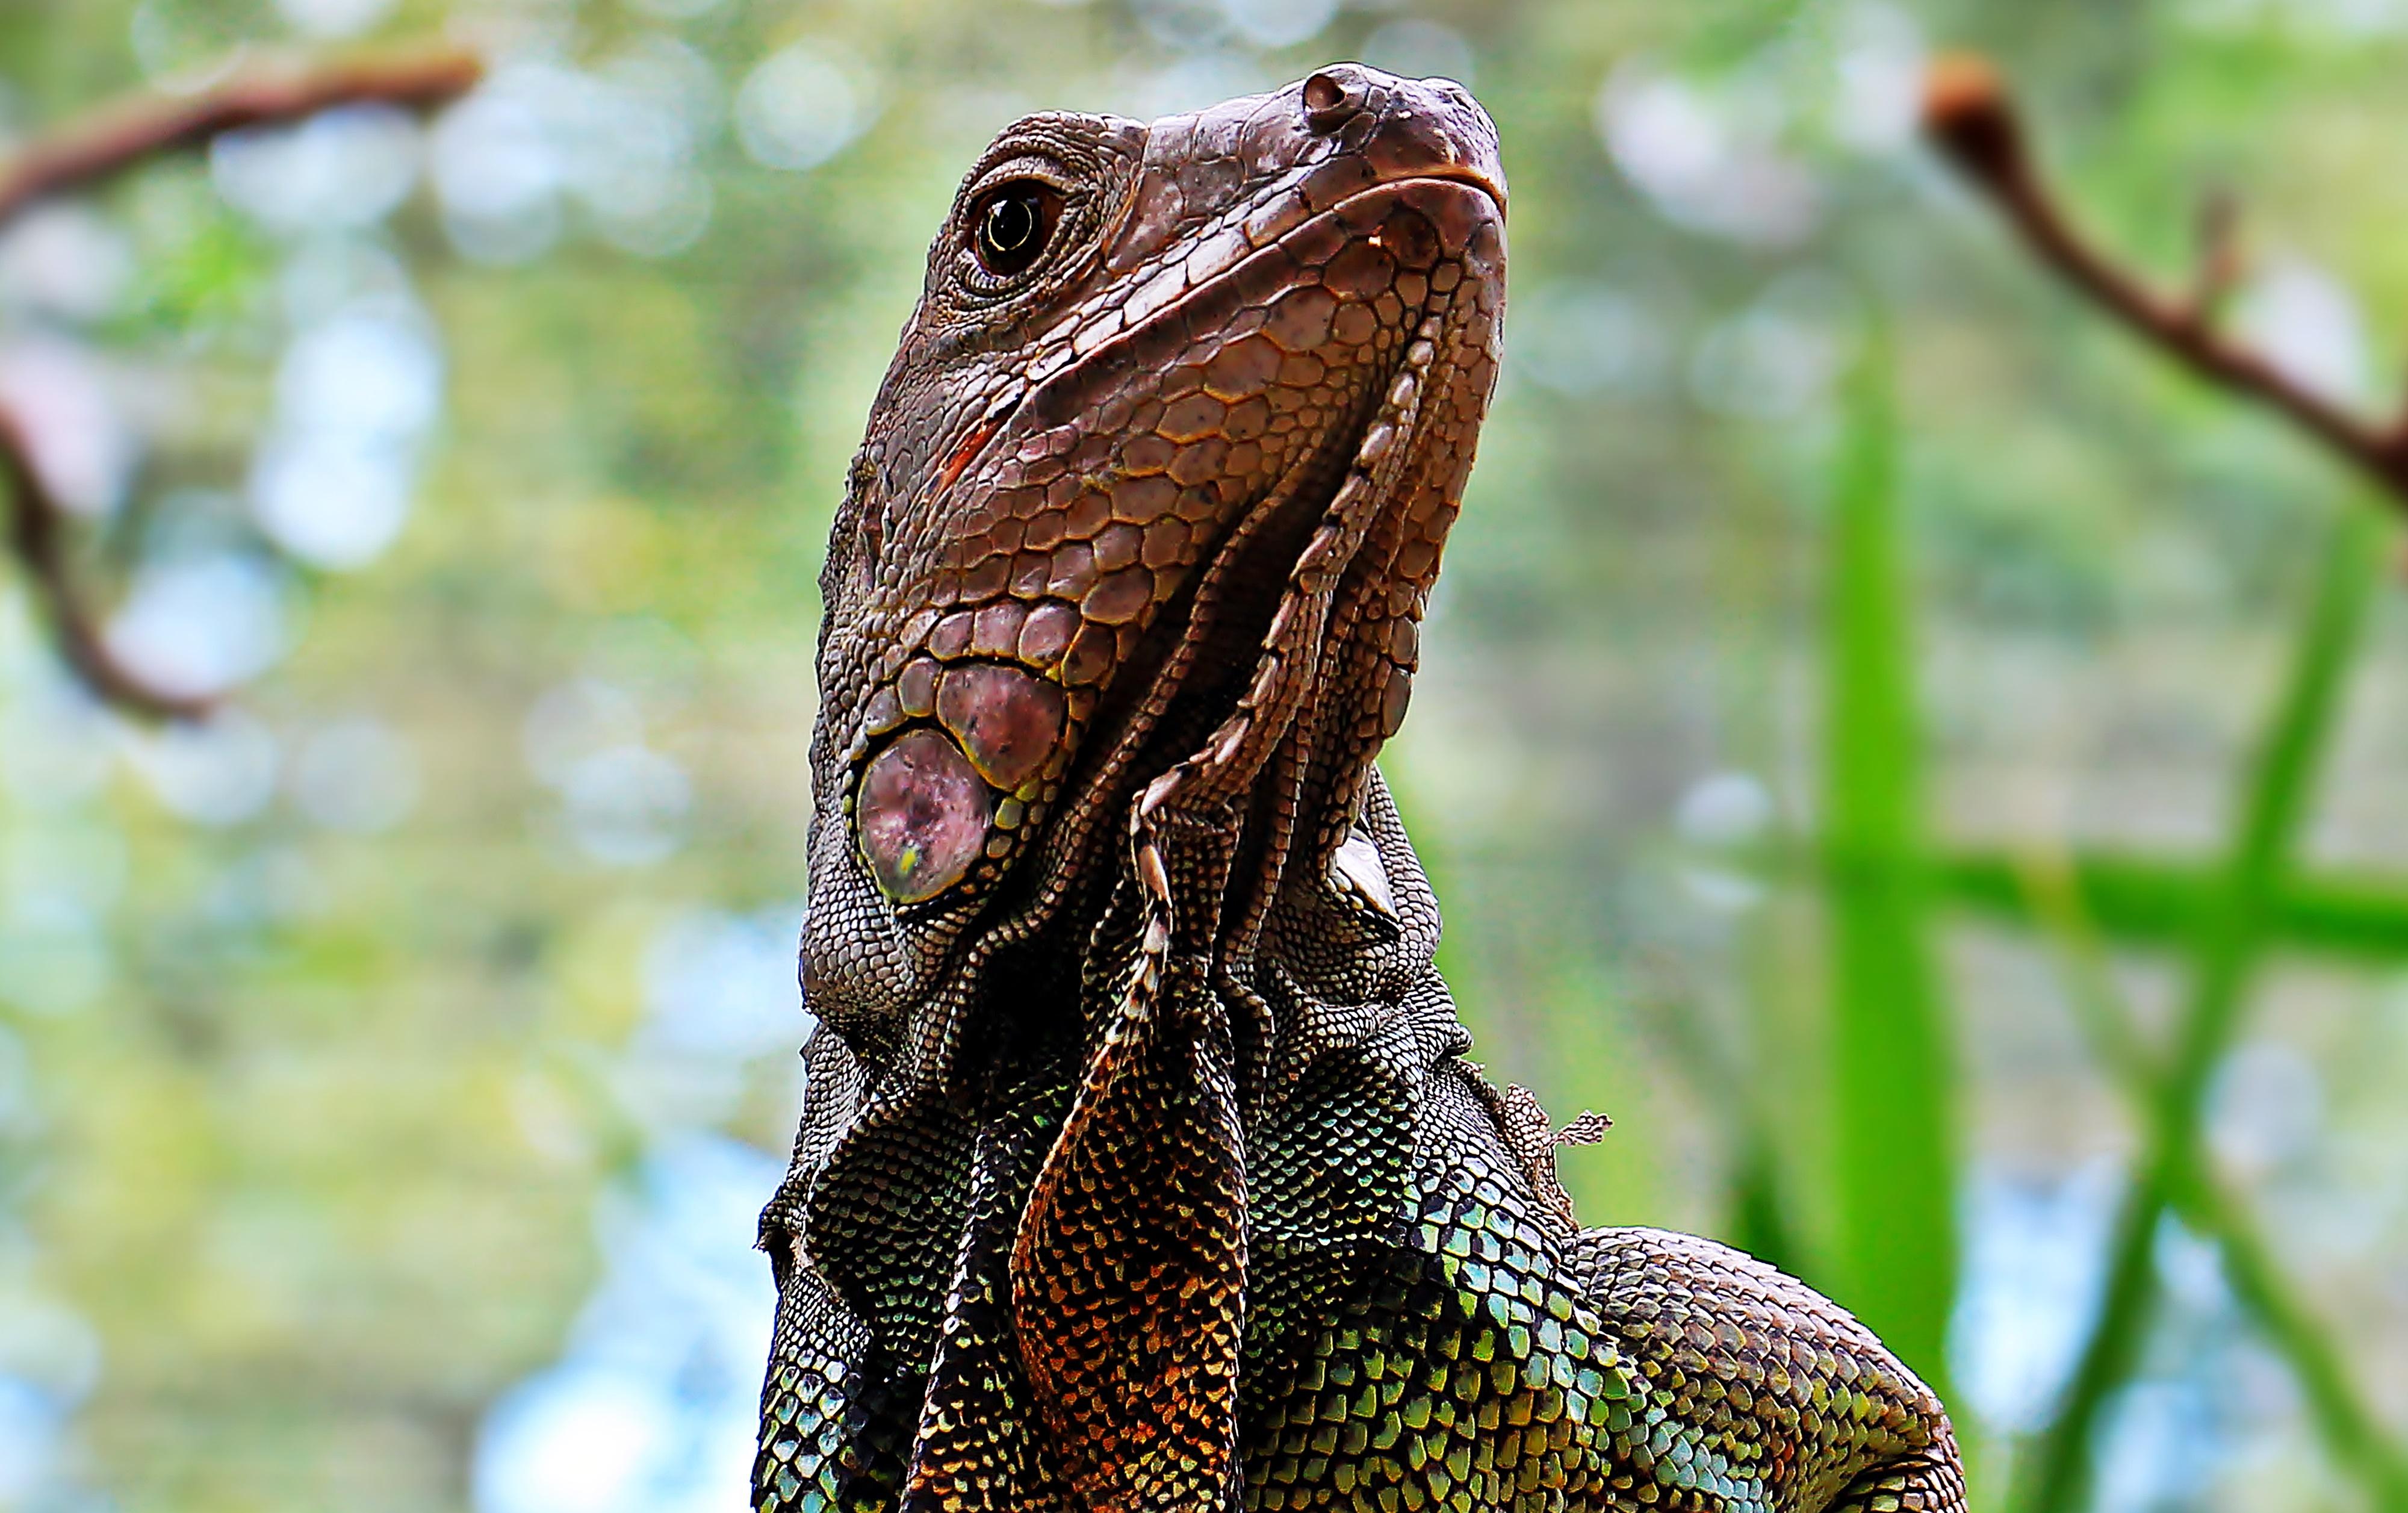 Wild Iguana, Animal, Iguana, Jungle, Lizard, HQ Photo